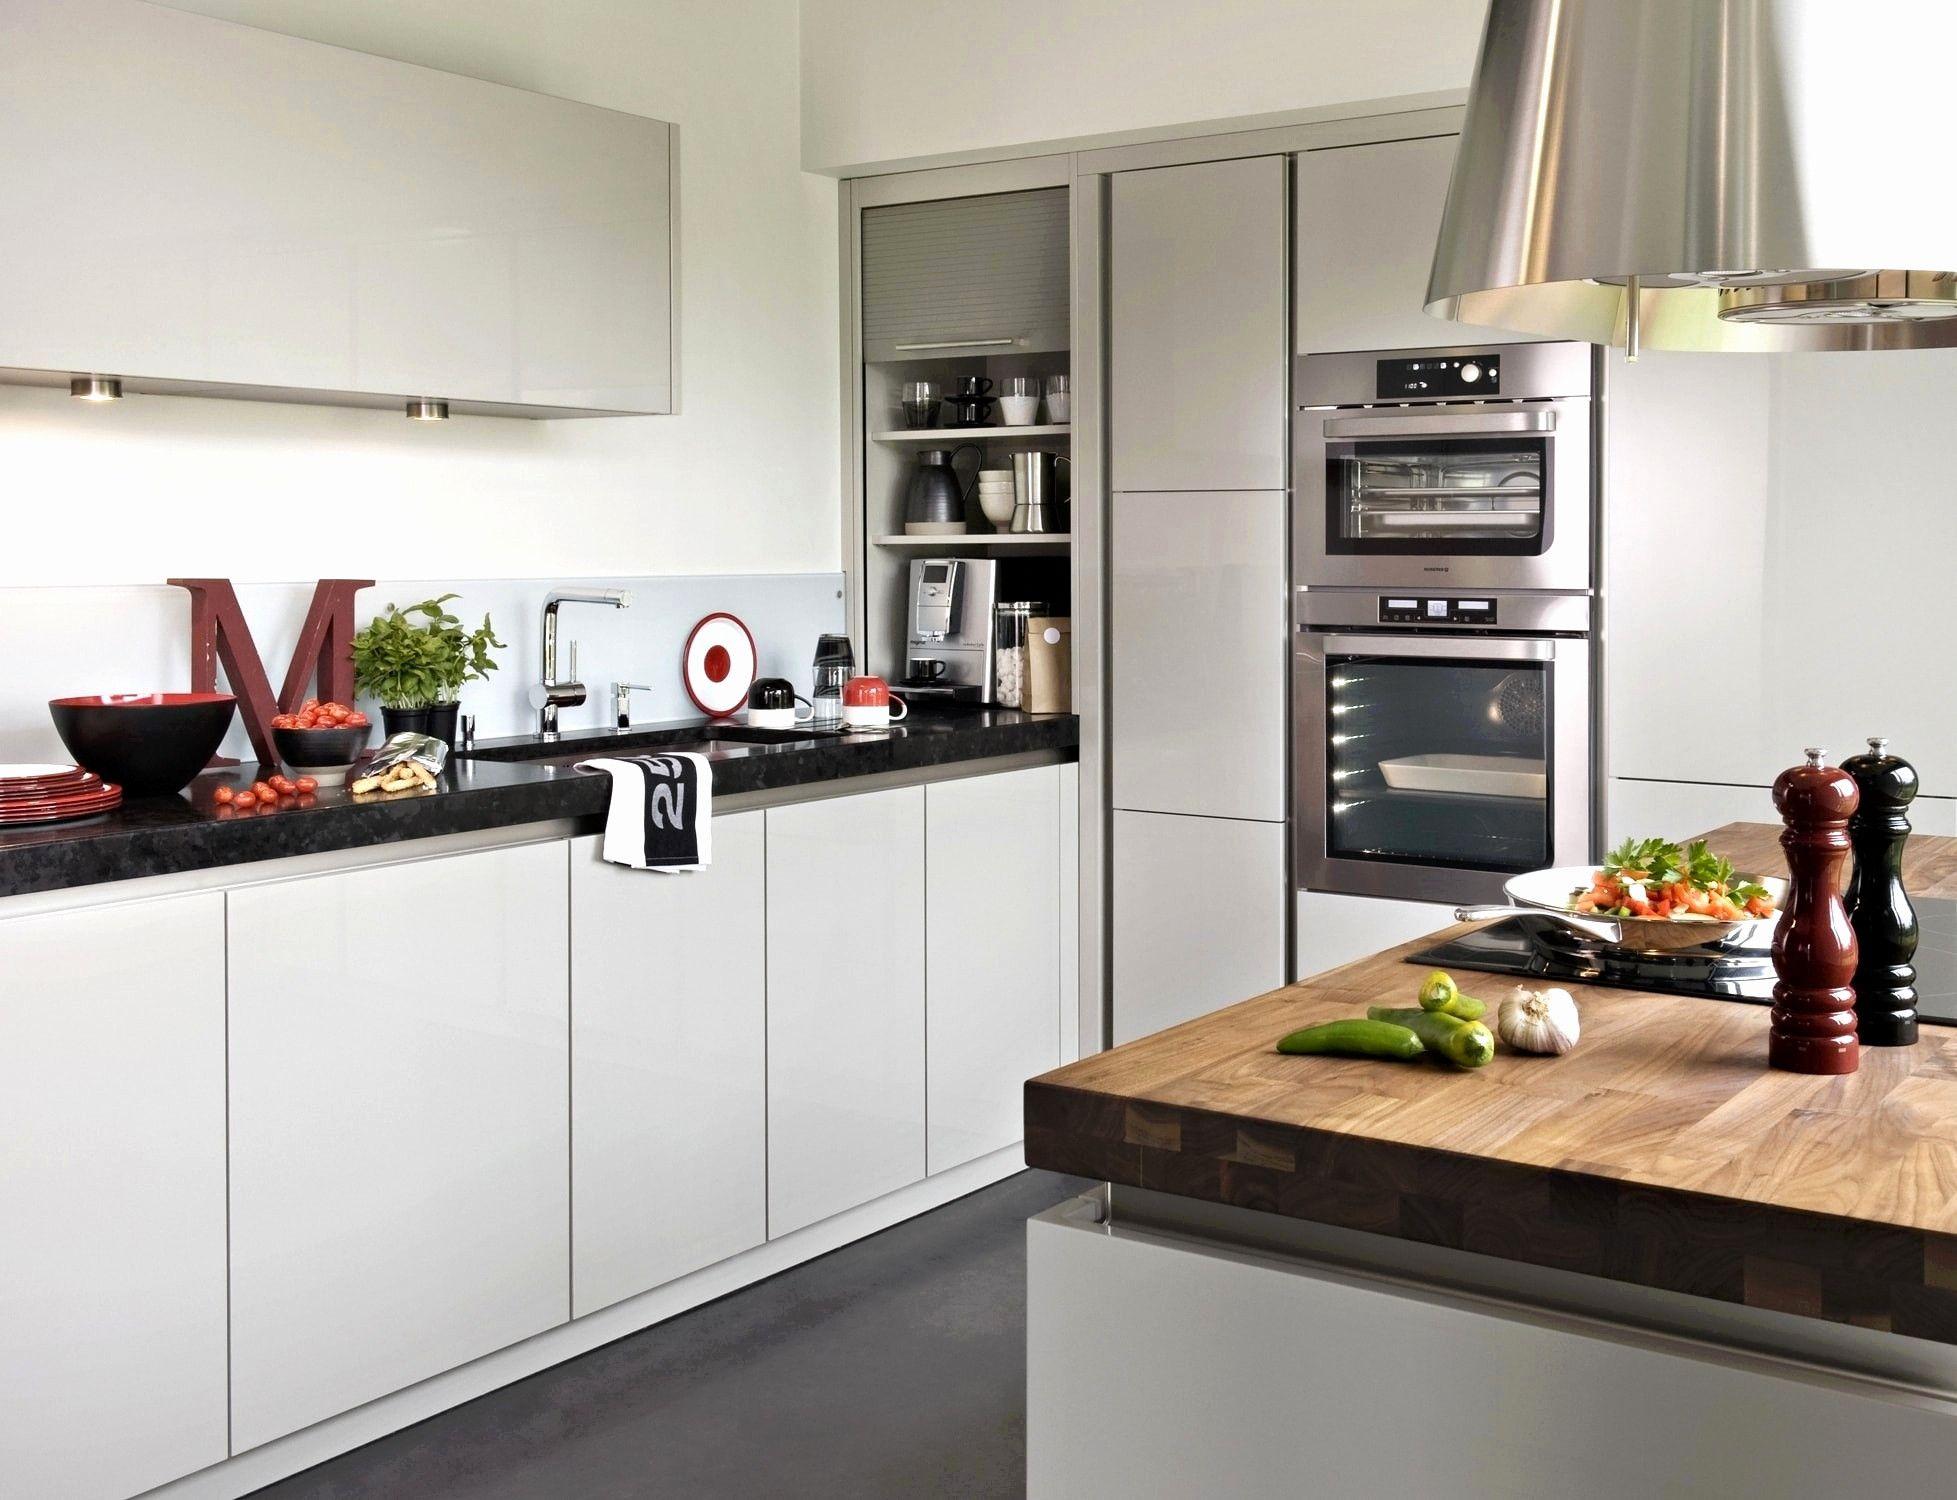 Beautiful Dimension Ilot Central Meuble Cuisine Mobilier De Salon Cuisine Moderne Design